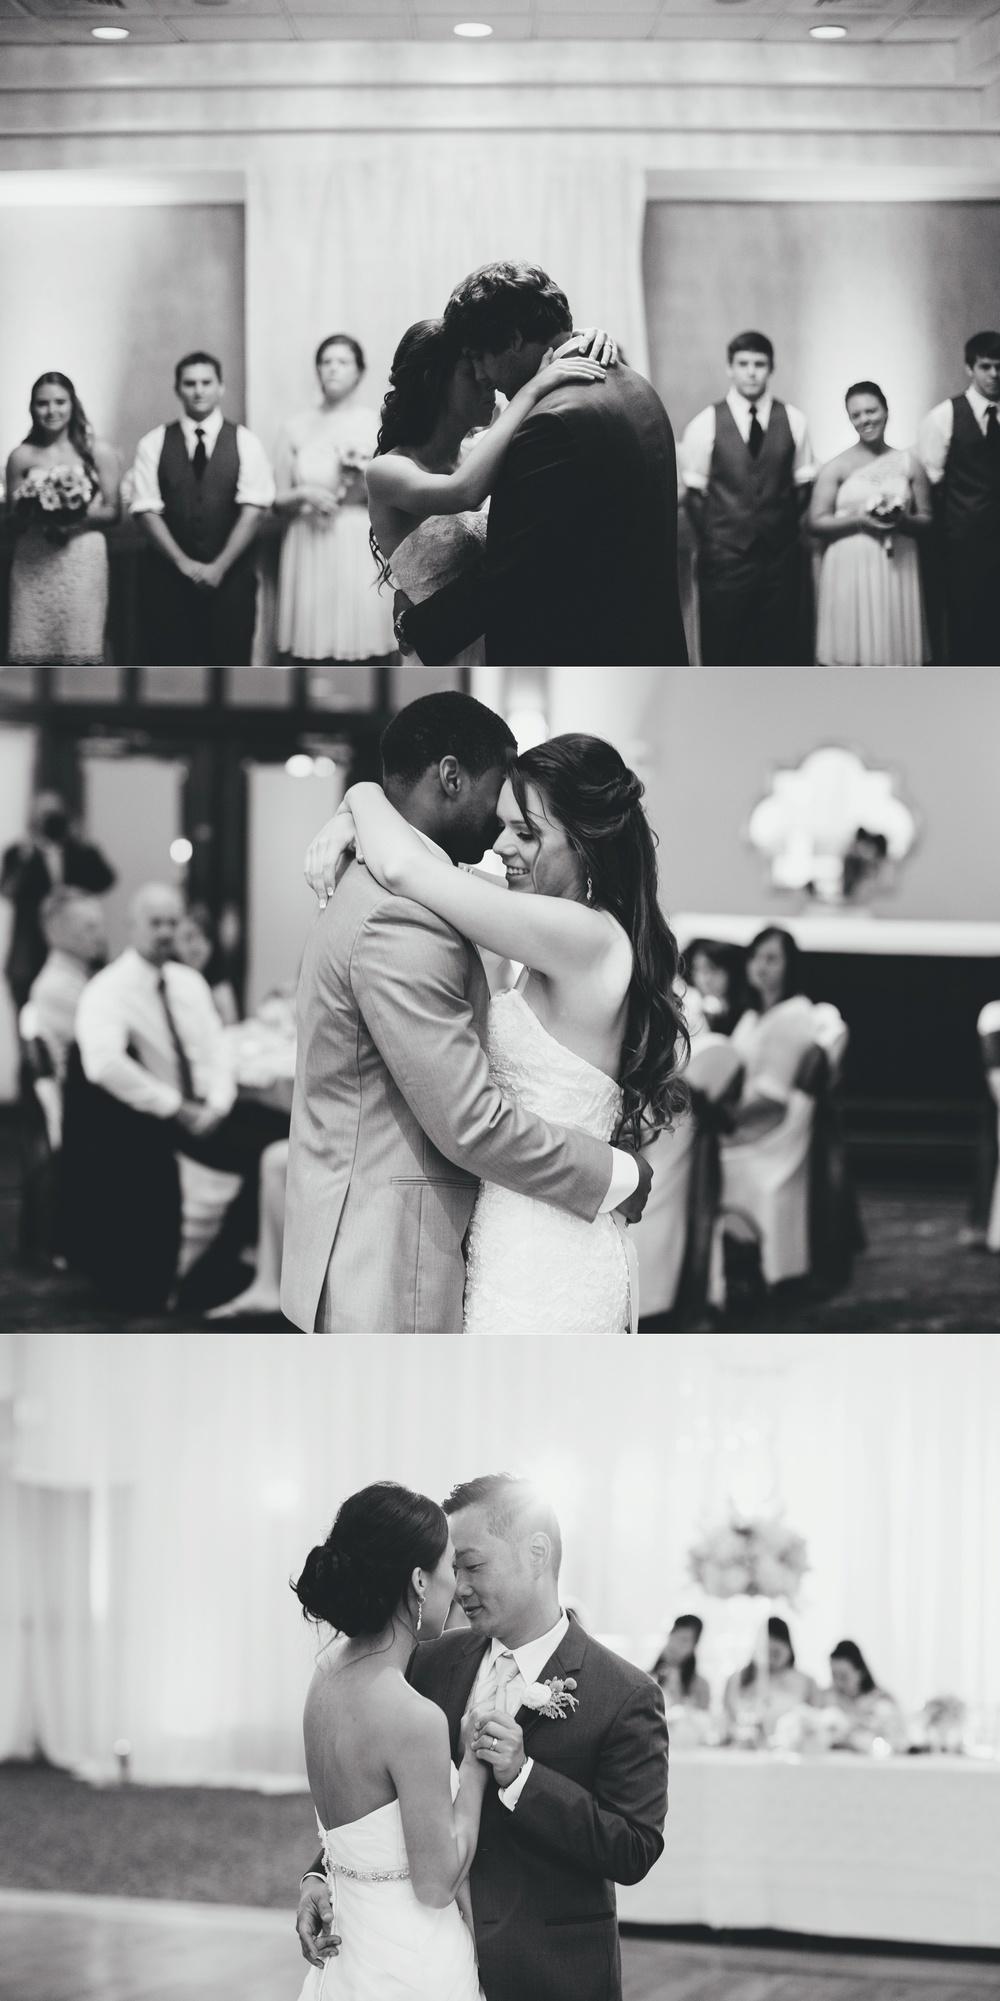 jake-and-katie-wedding-favorites-2015-55